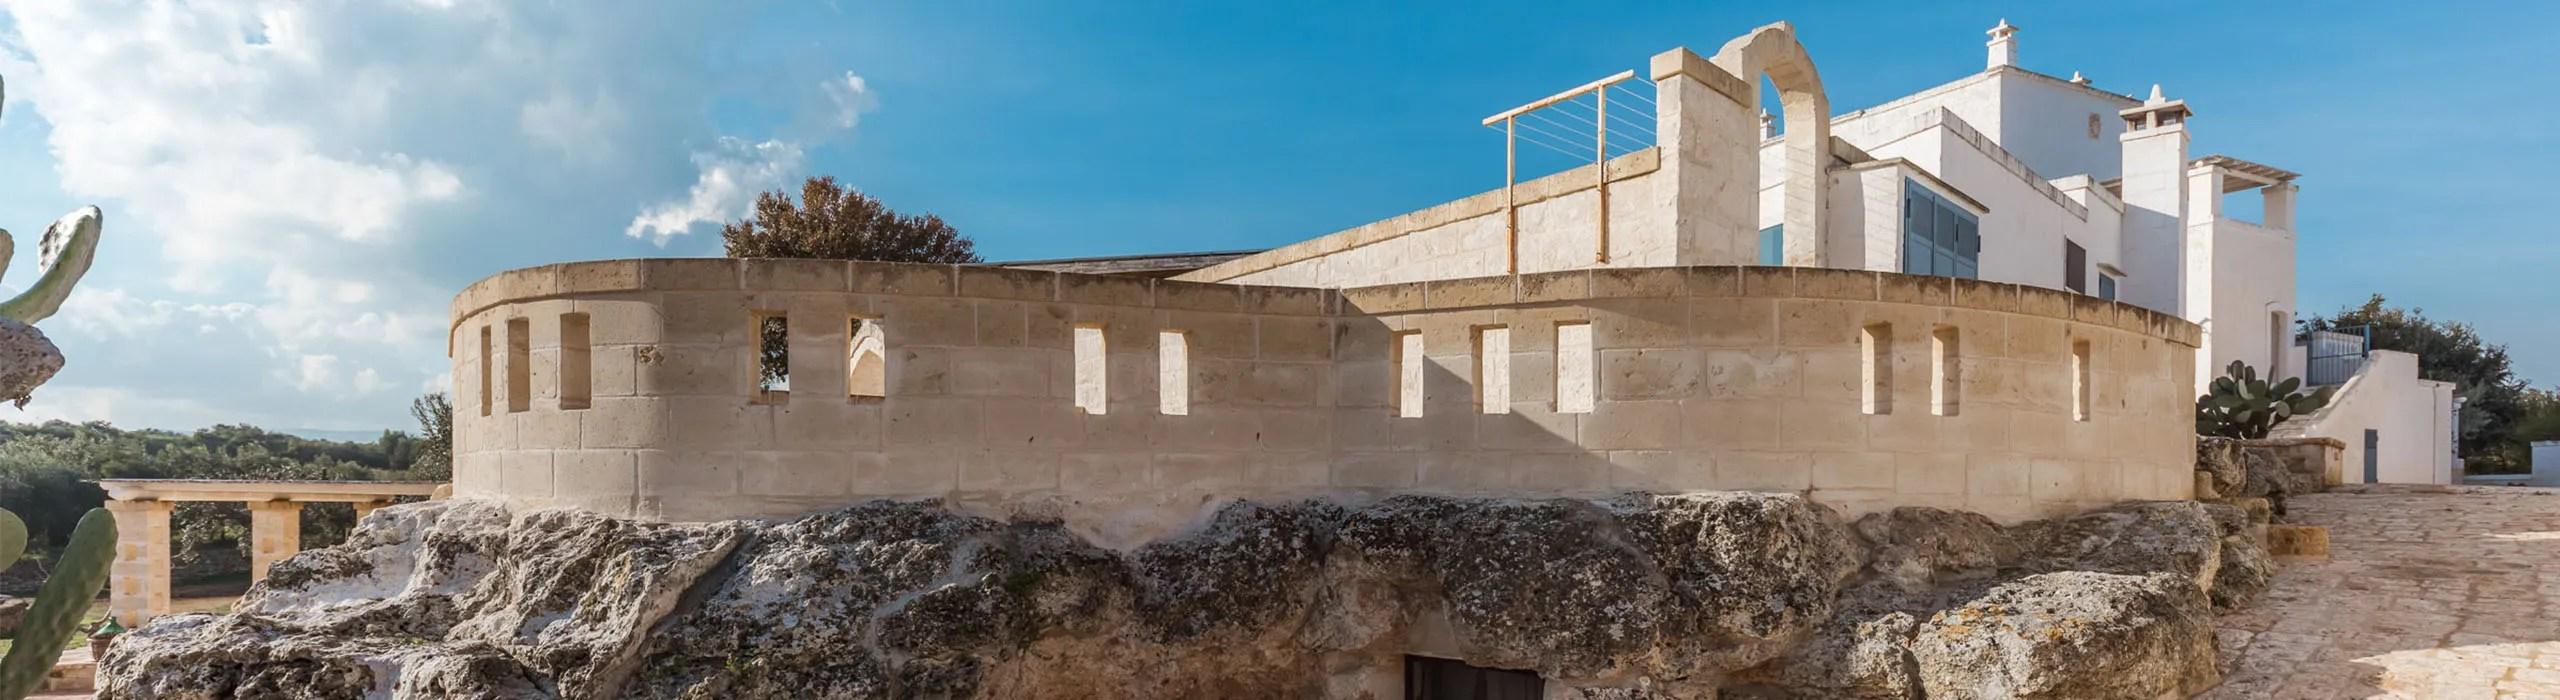 Luxury Vacation Masseria in Puglia by BeeYond Travel